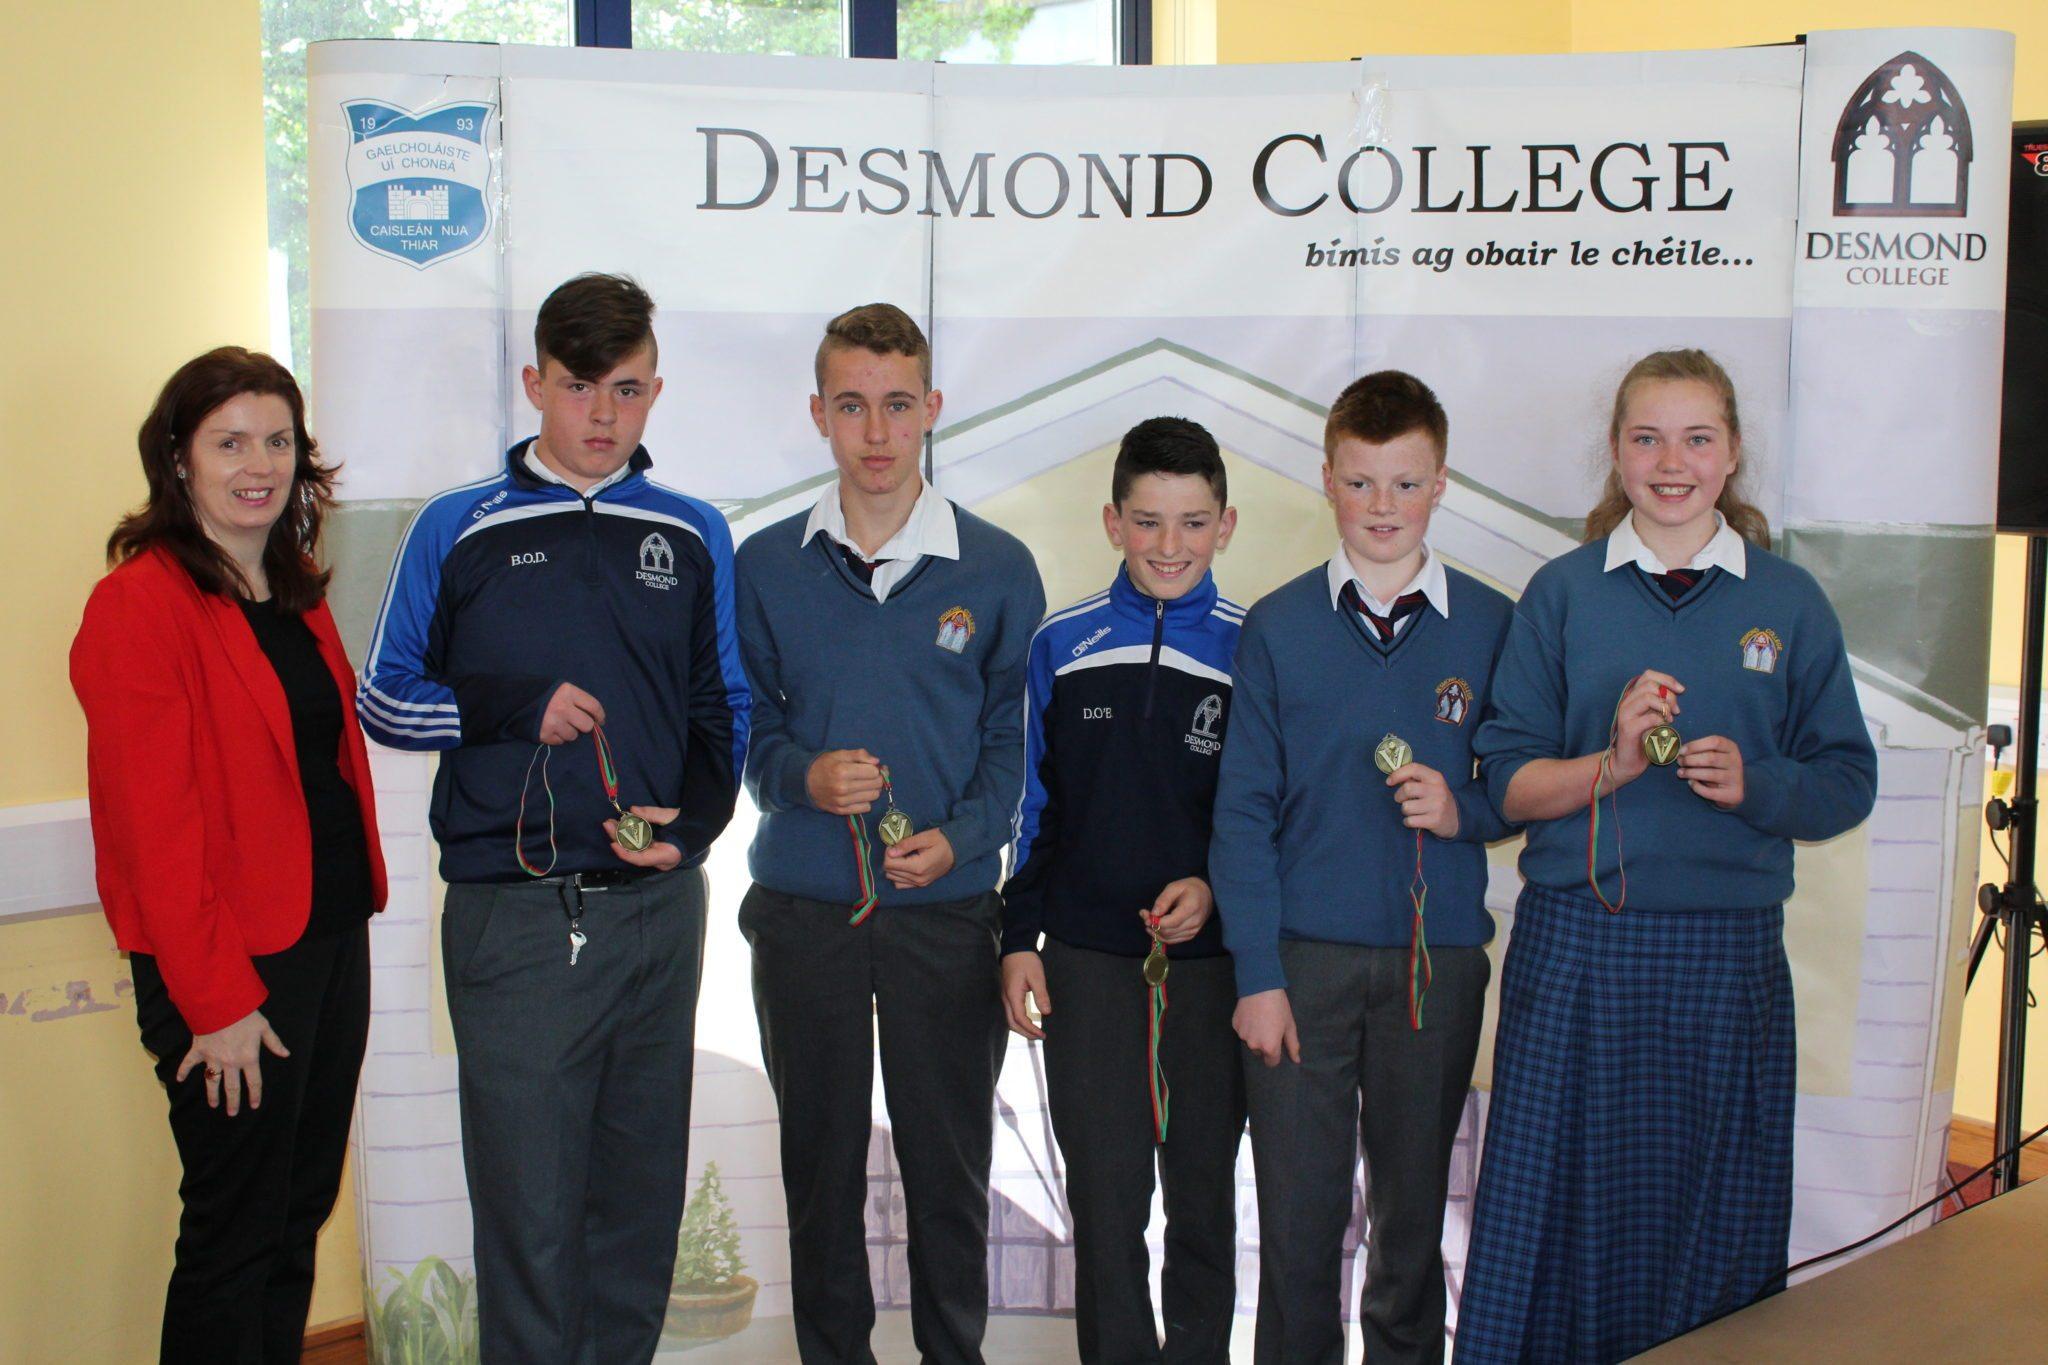 Desmond College Student Awards: May 2015: SPORTS AWARDS First year : Ms Walsh with Bobby O'Donovan, Michael Conlon, David O'Brien, Diarmuid O'Flynn, and Siobhan Hurley